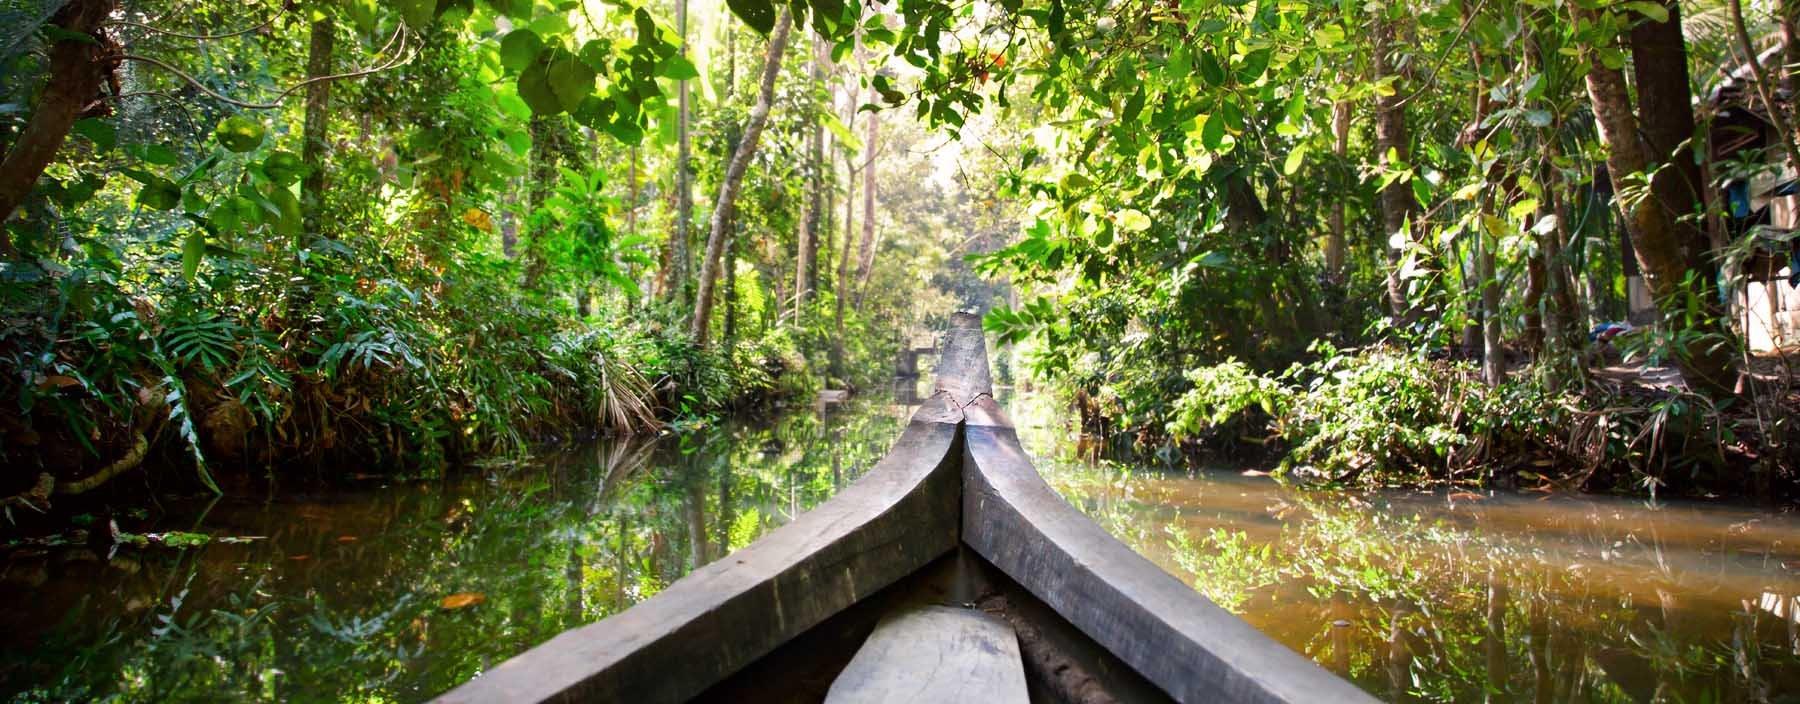 in, kerala, cruise in backwaters jungle in kochin.jpg